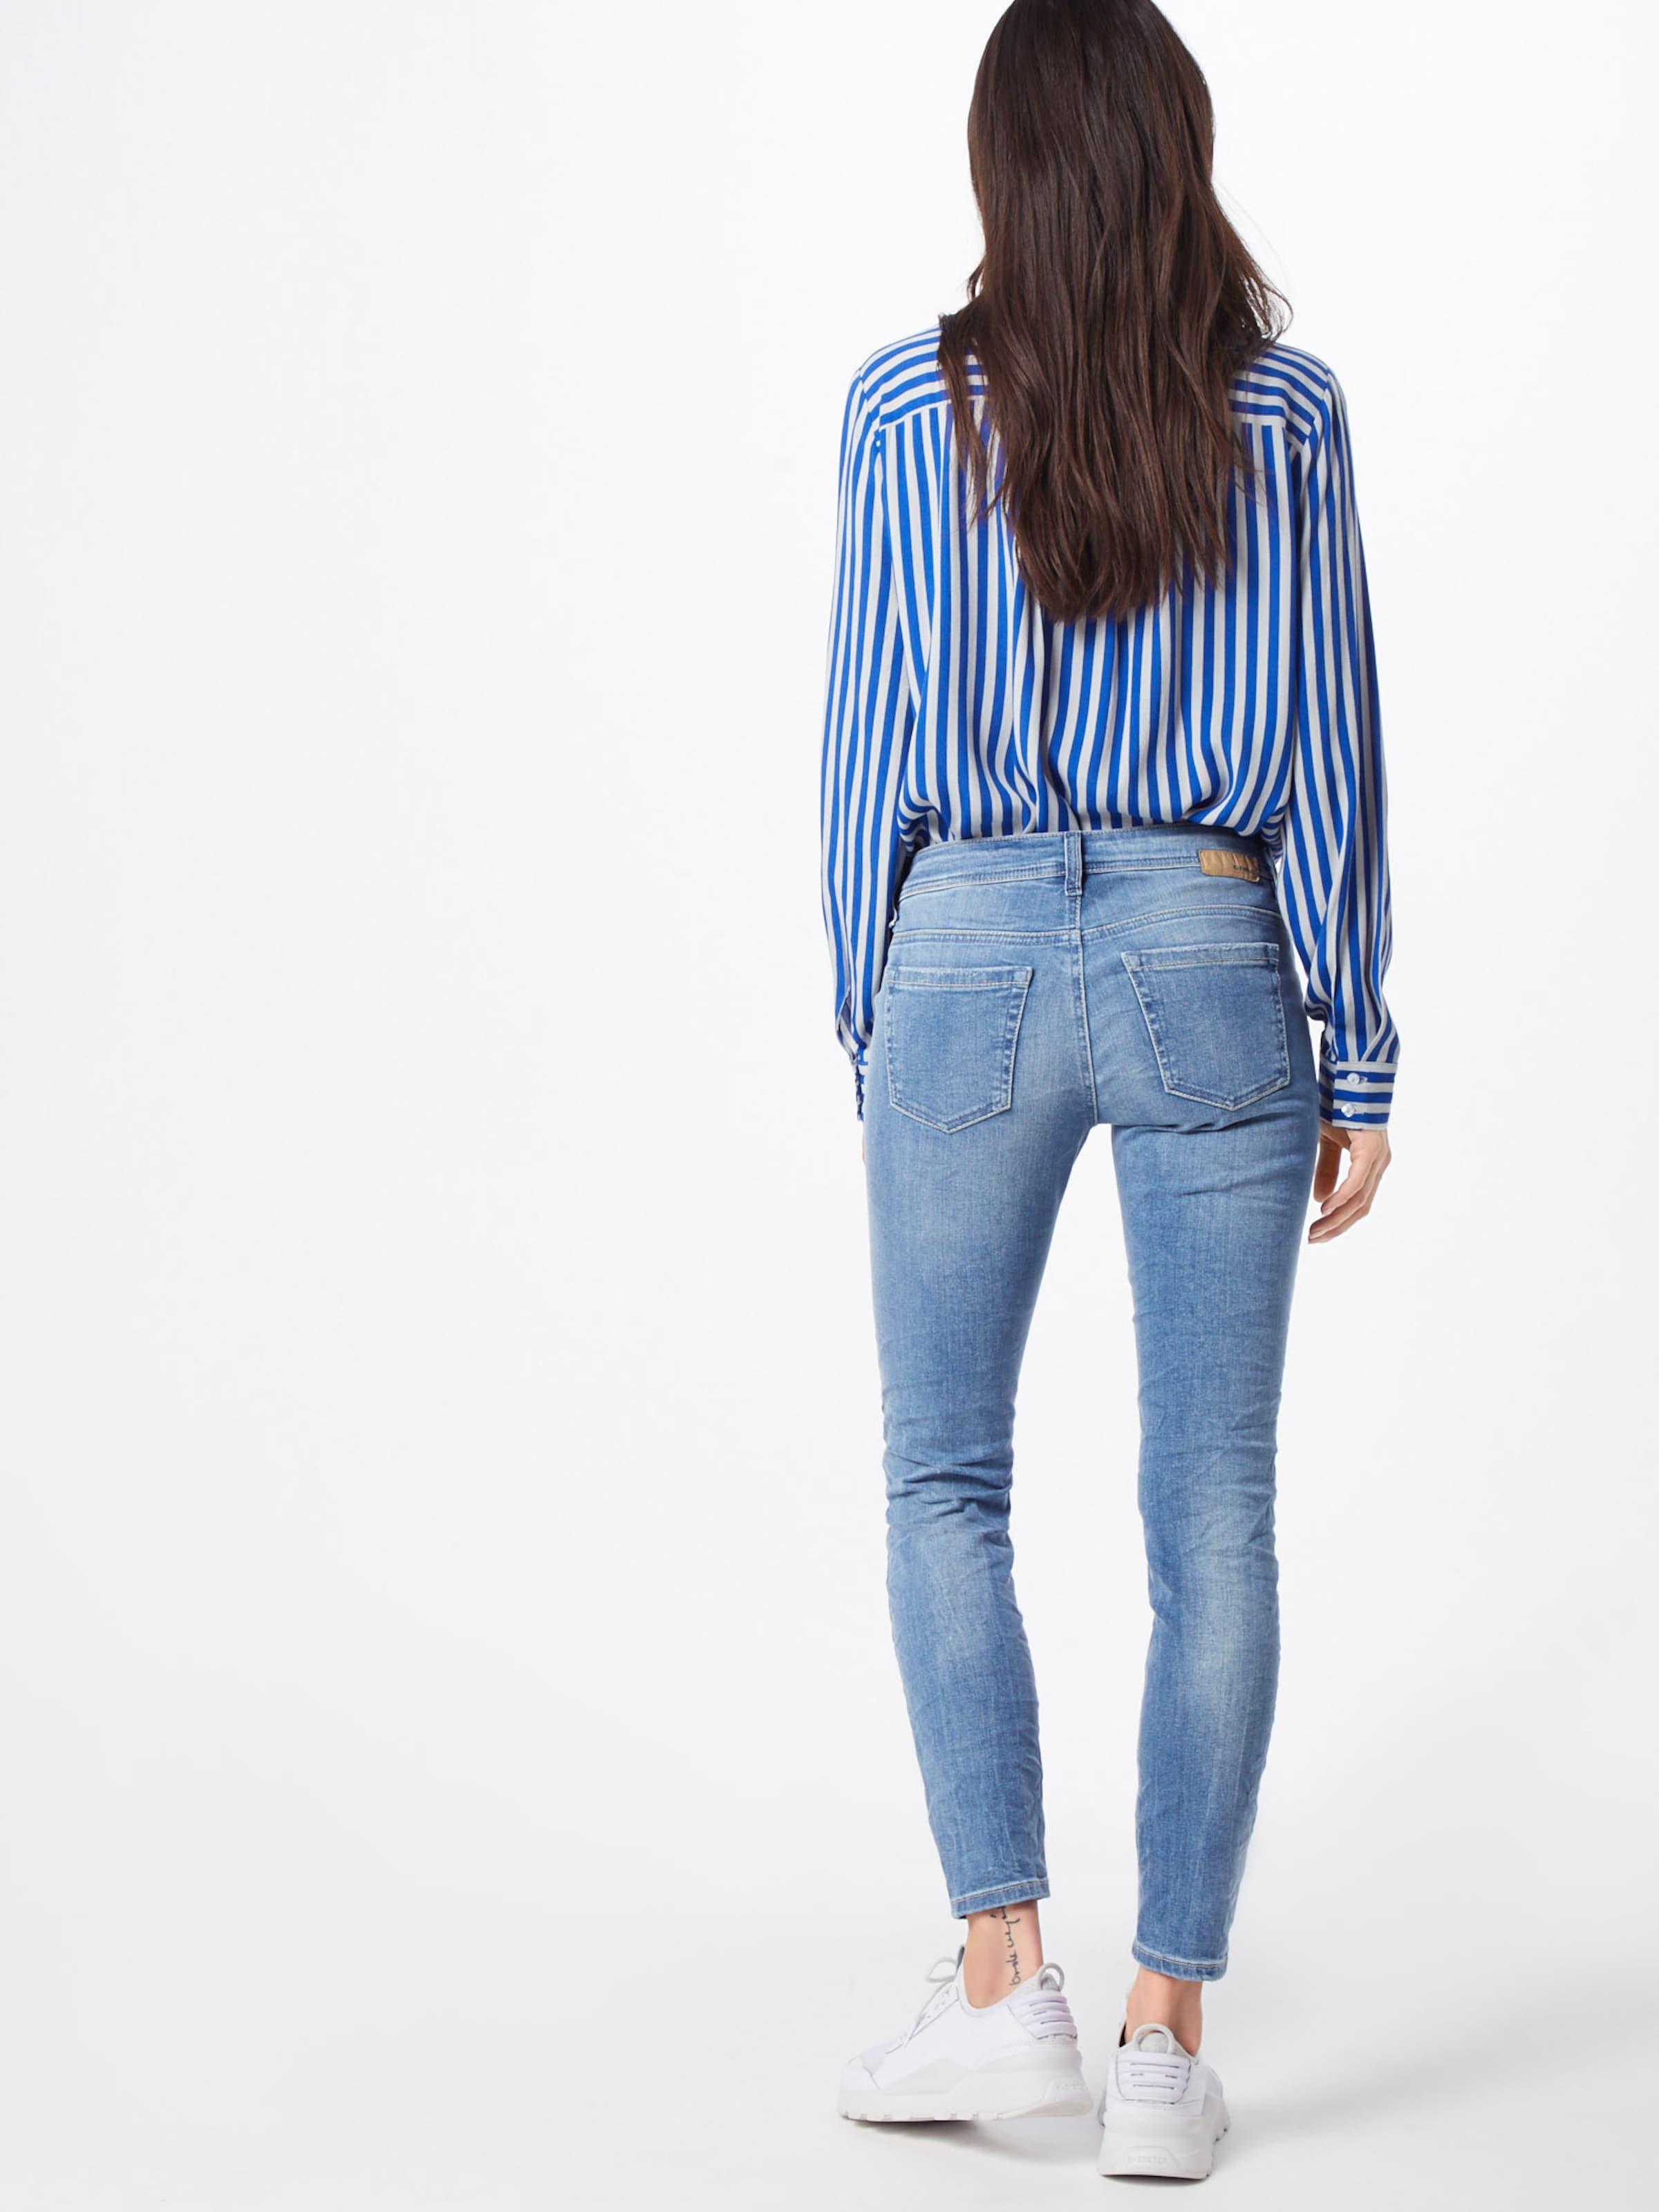 Jeans Jeans Gang 'faye' Dunkelblau In In Gang Dunkelblau 'faye' eHbW2YEID9